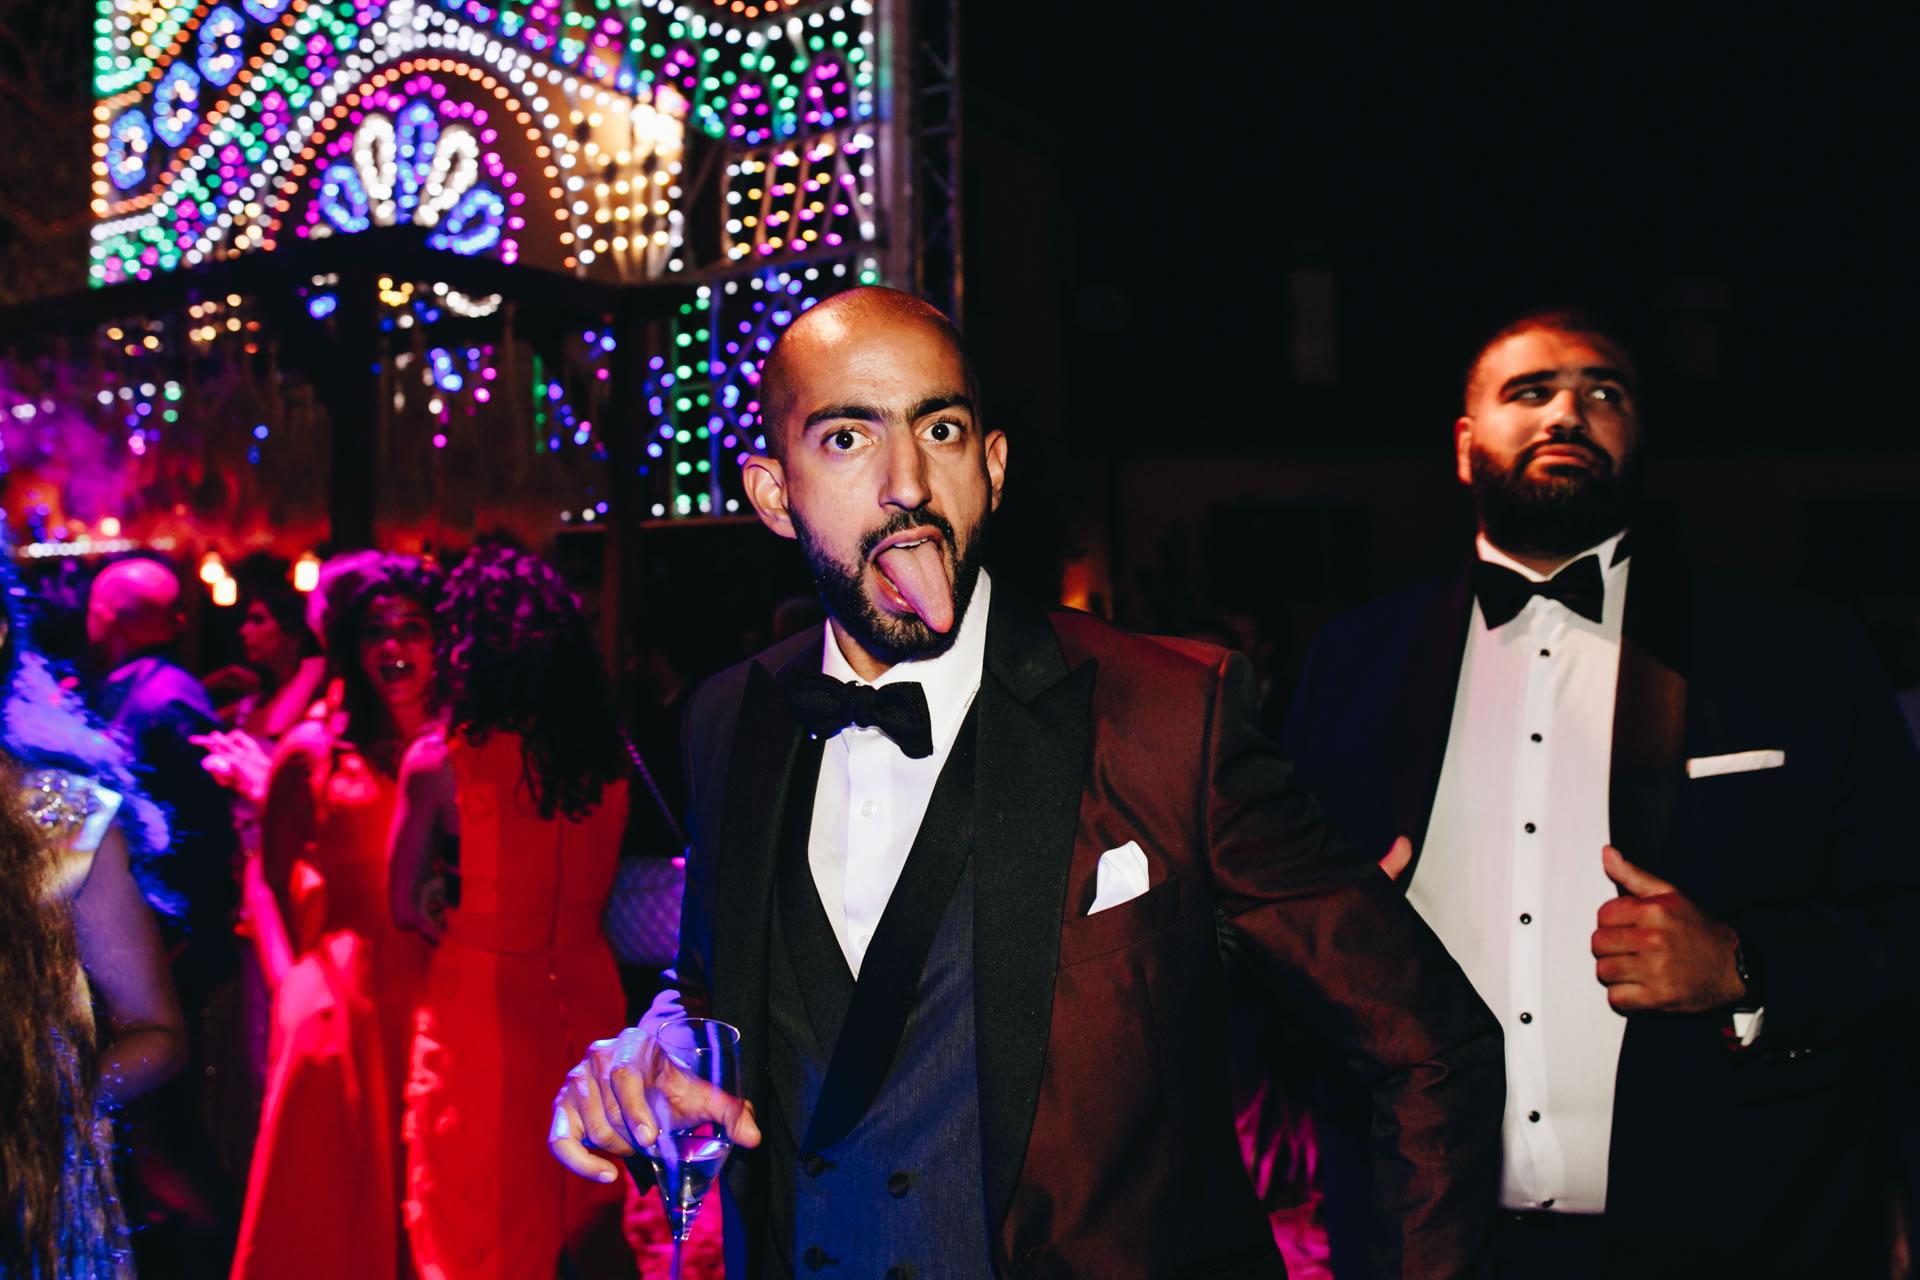 il-borro-luxury-wedding-david-bastianoni-photographer-00078 - 77 :: Luxury wedding at Il Borro :: Luxury wedding photography - 76 :: il-borro-luxury-wedding-david-bastianoni-photographer-00078 - 77